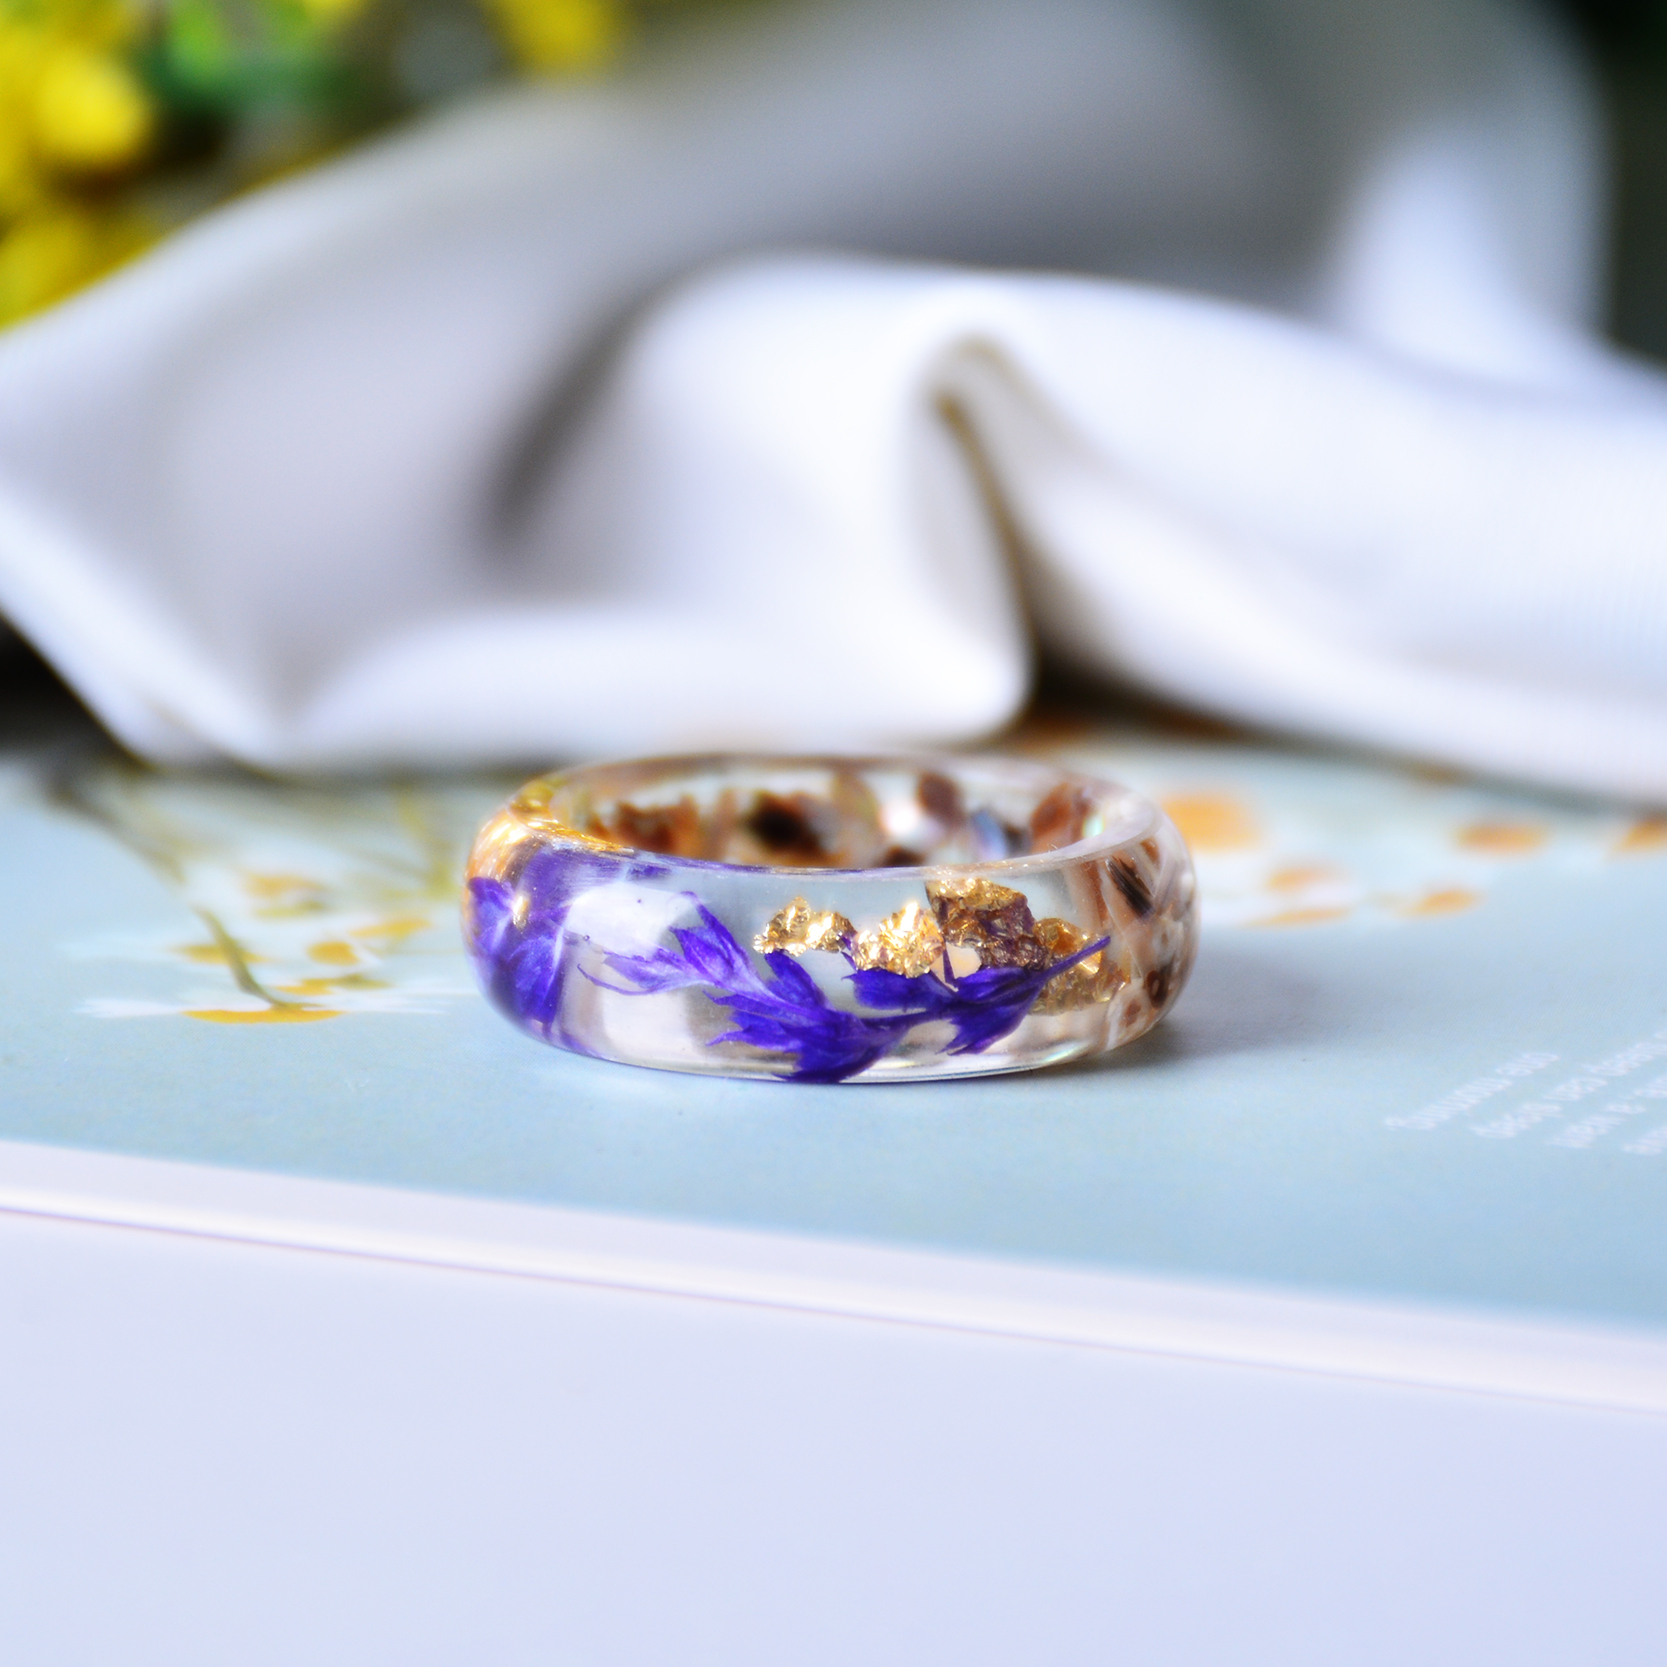 Ha784ee09230d46ffb98b231c9408330aq - Magic of Flowers Ring